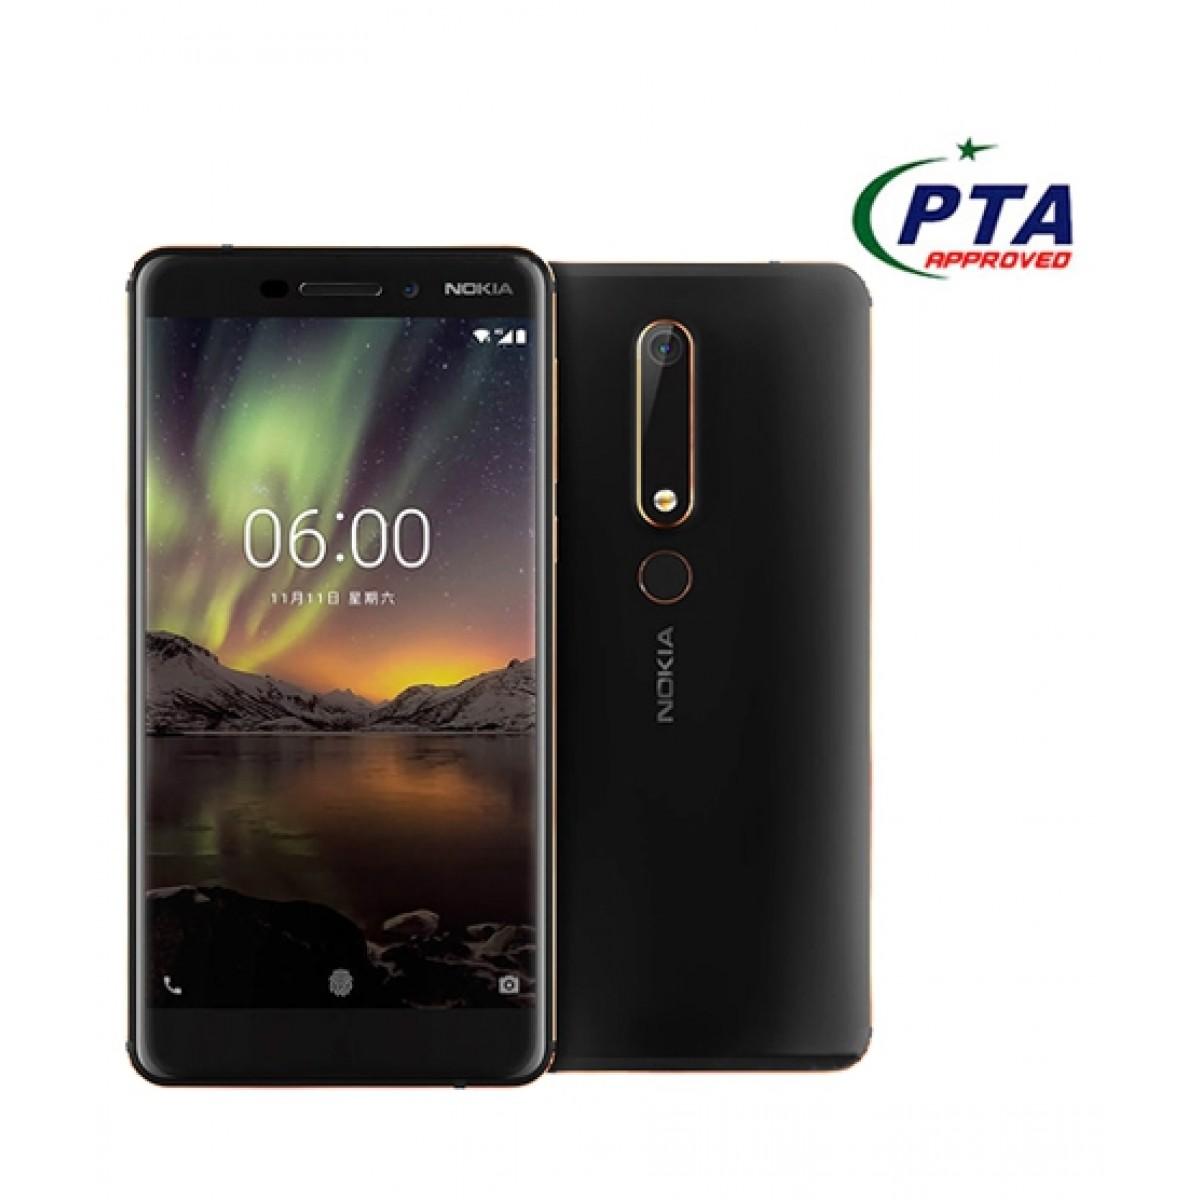 Nokia 6.1 64GB Dual Sim Black/Copper - Official Warranty